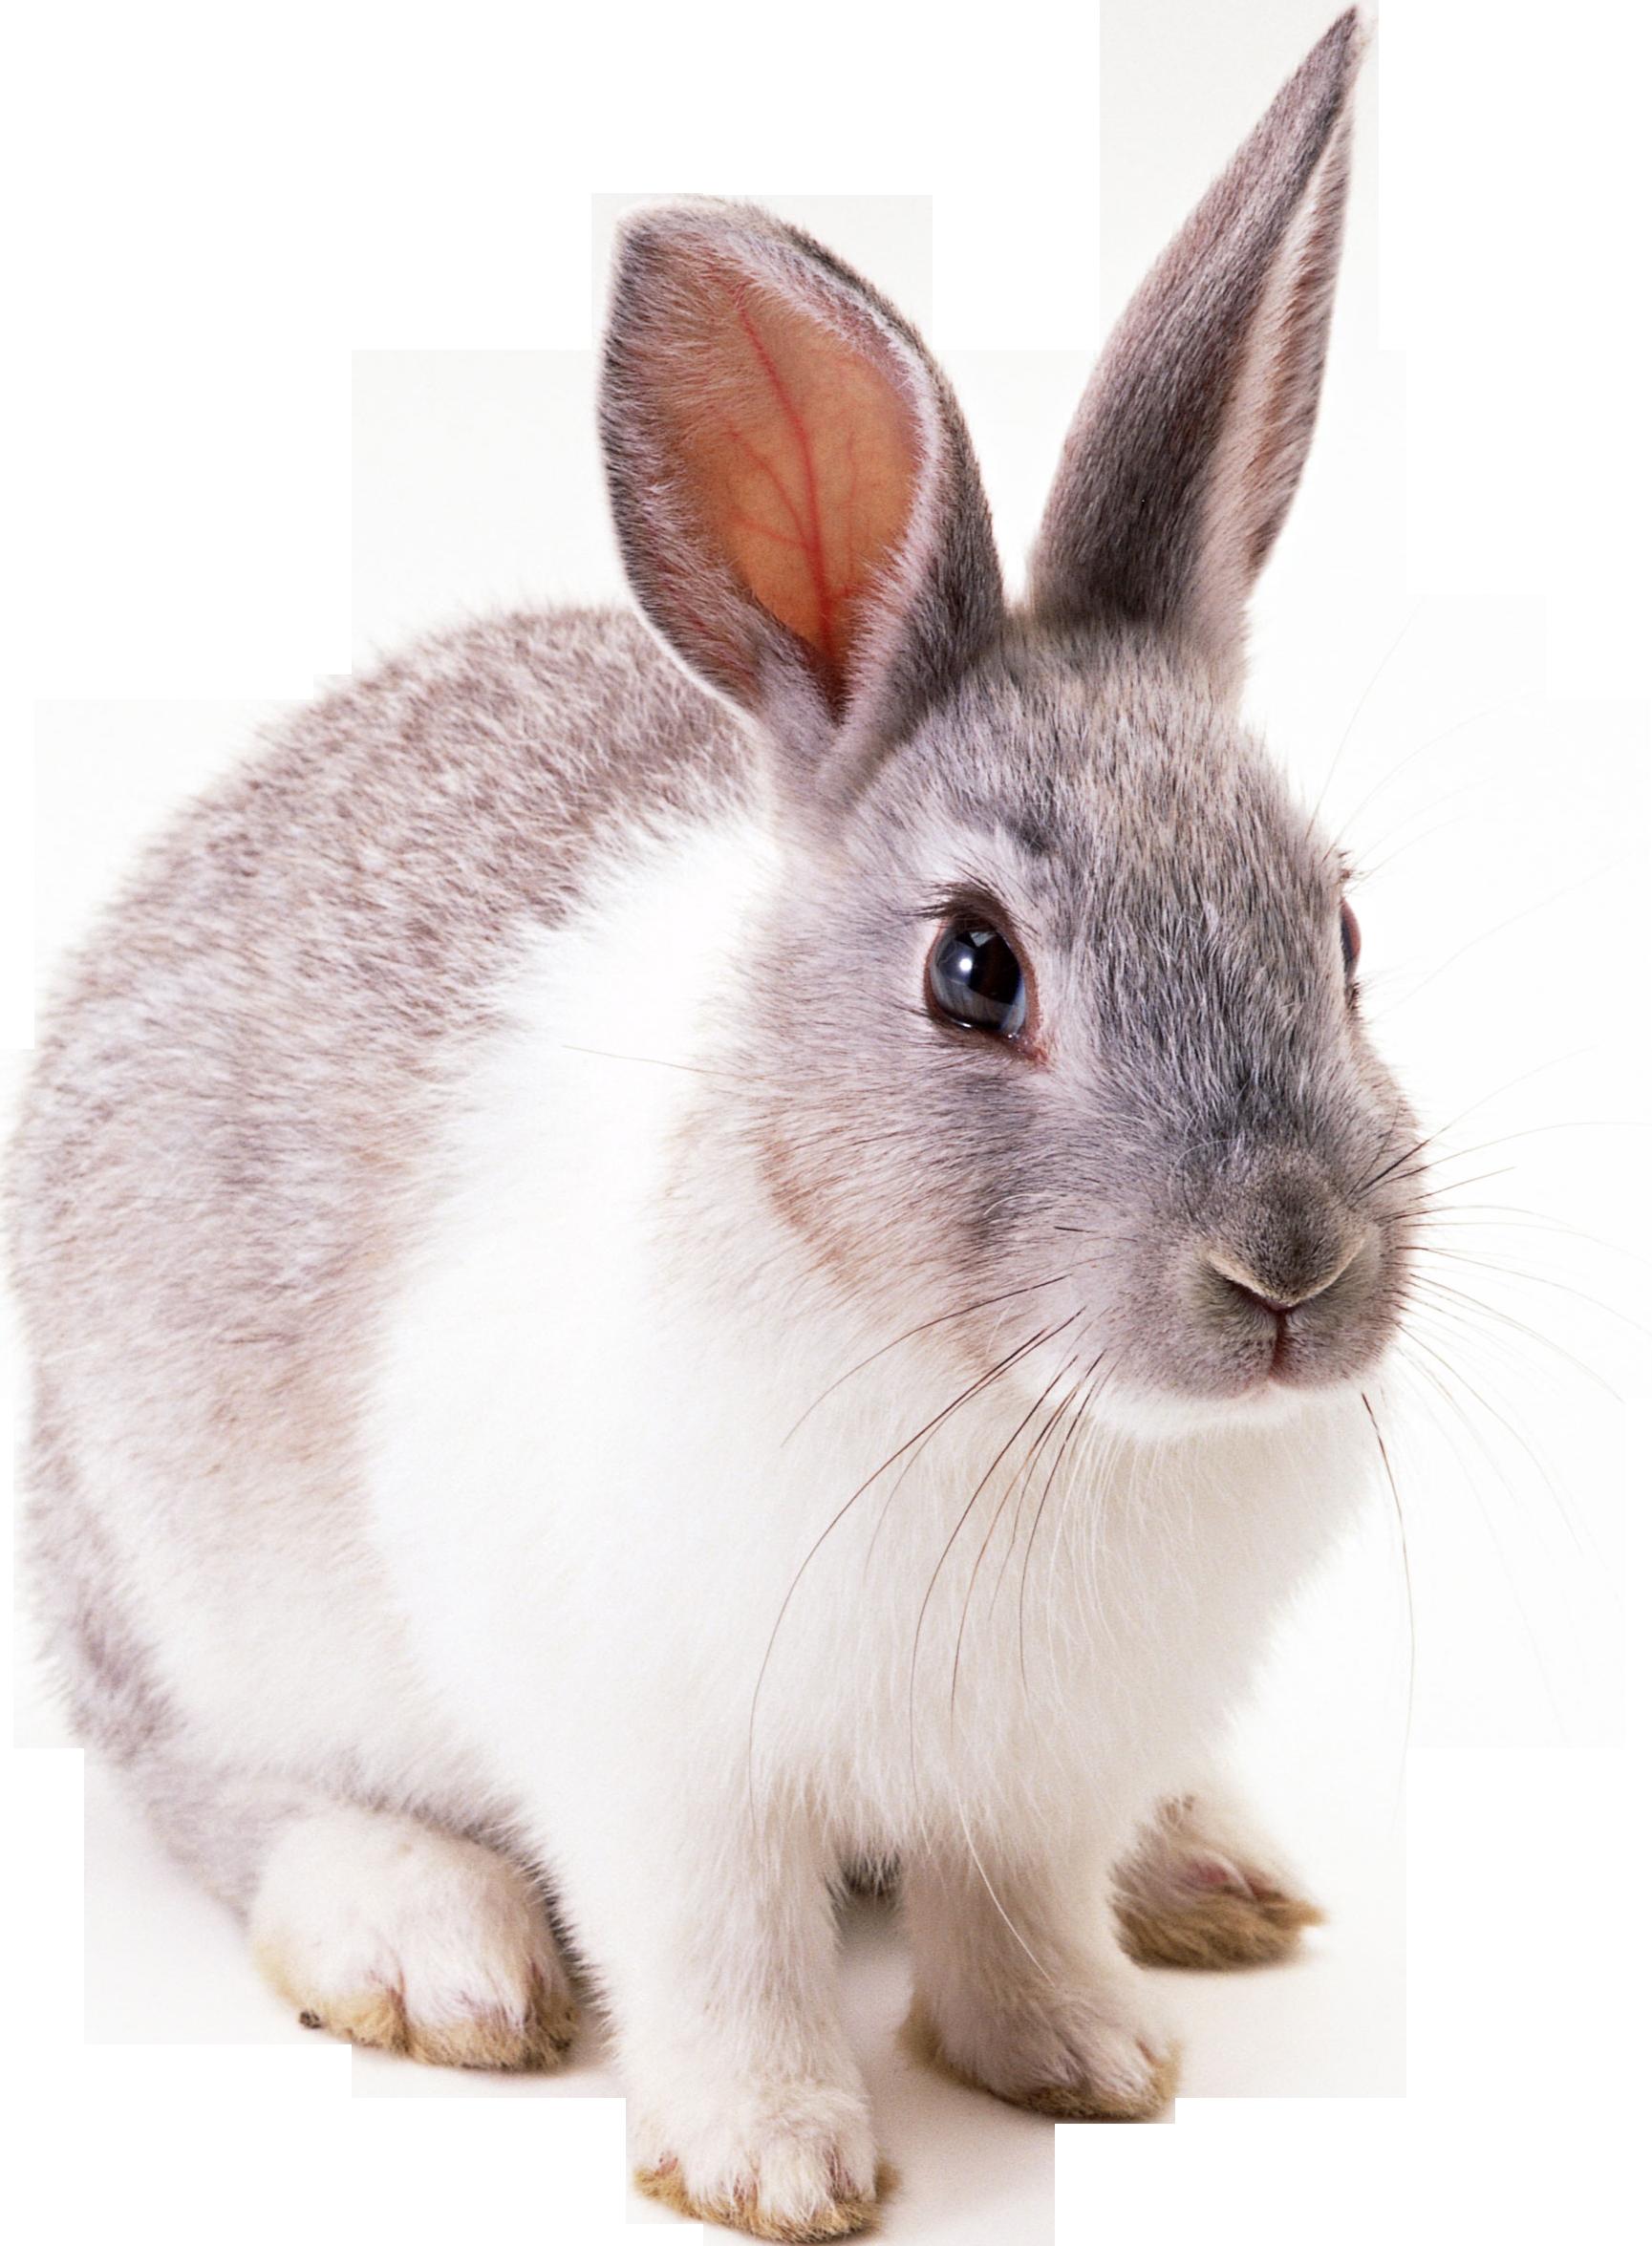 Rabbit Png image #40340